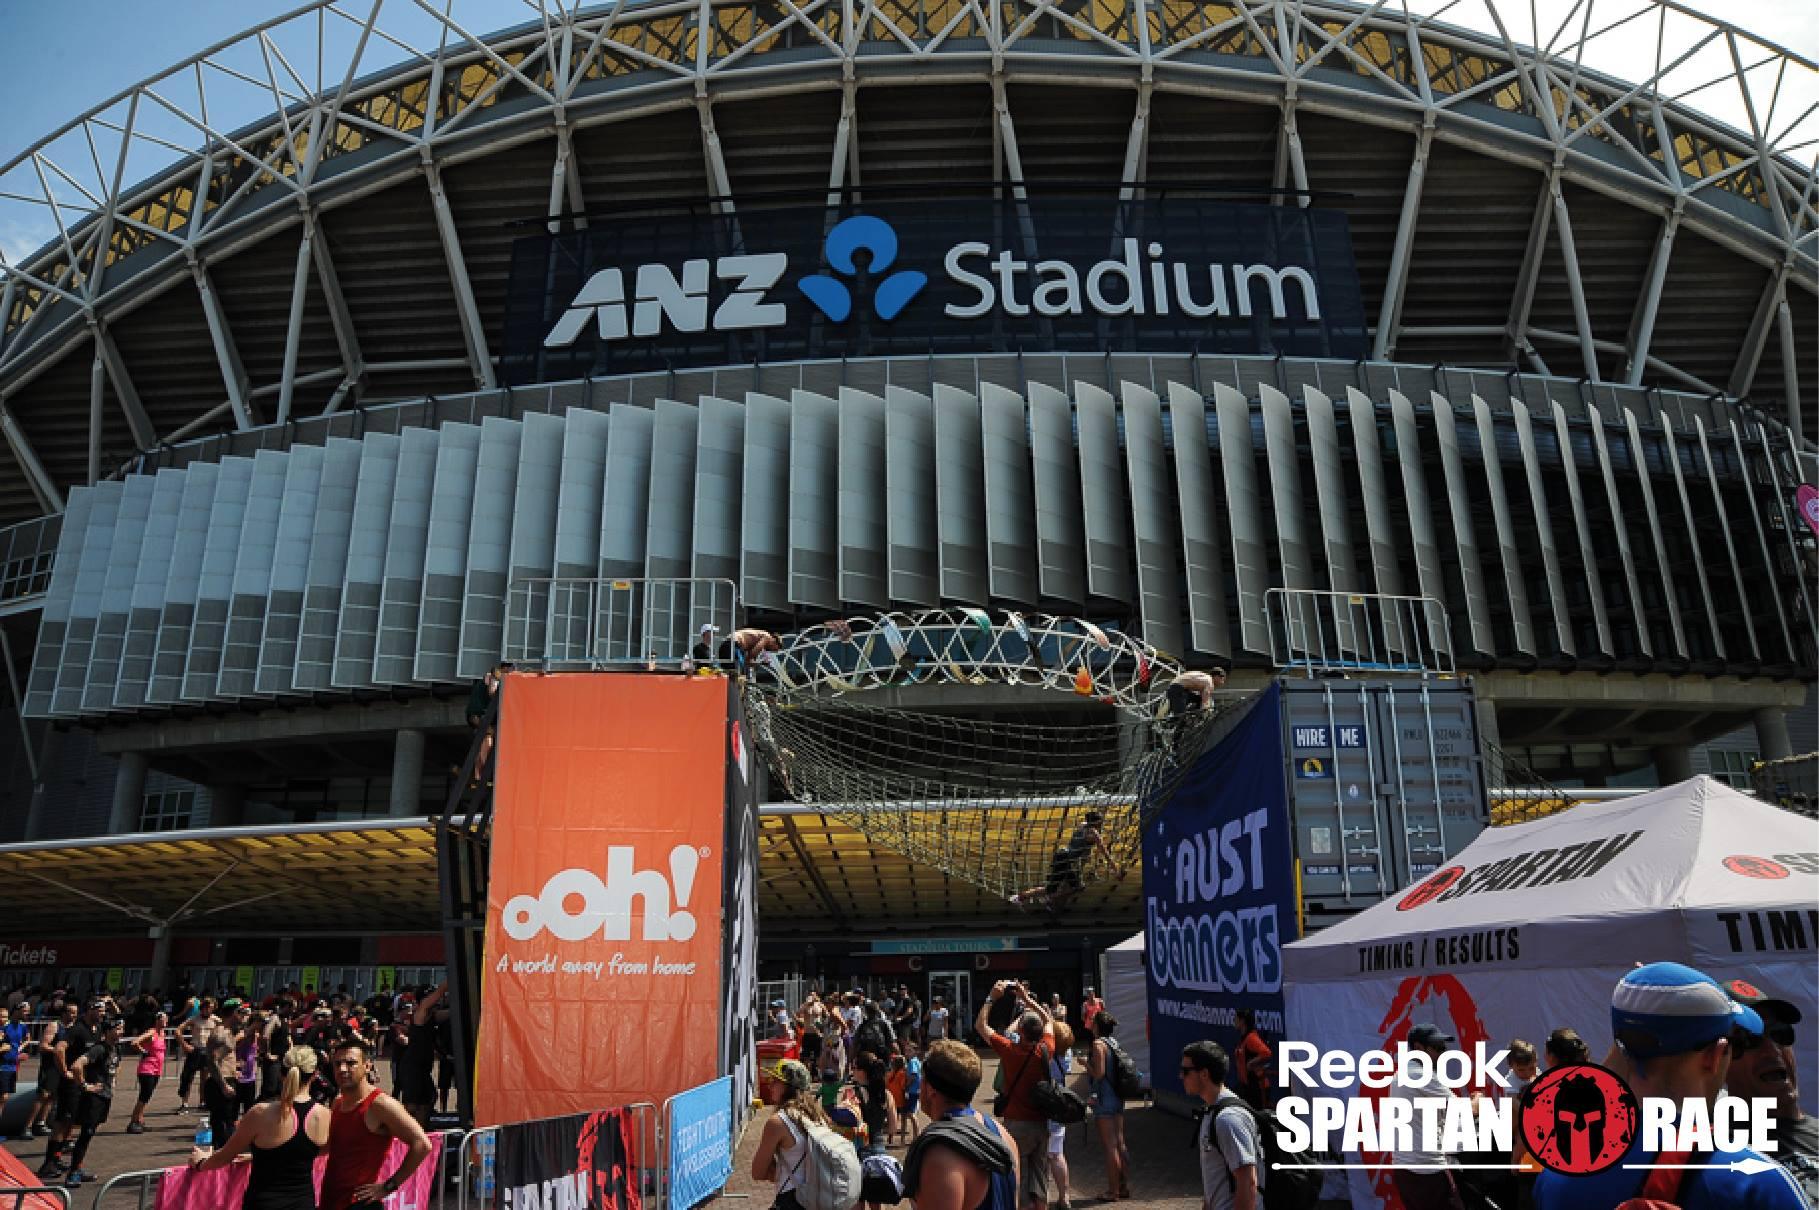 Spartan Race 300 Standalone Event - Sydney Stadium Sprint